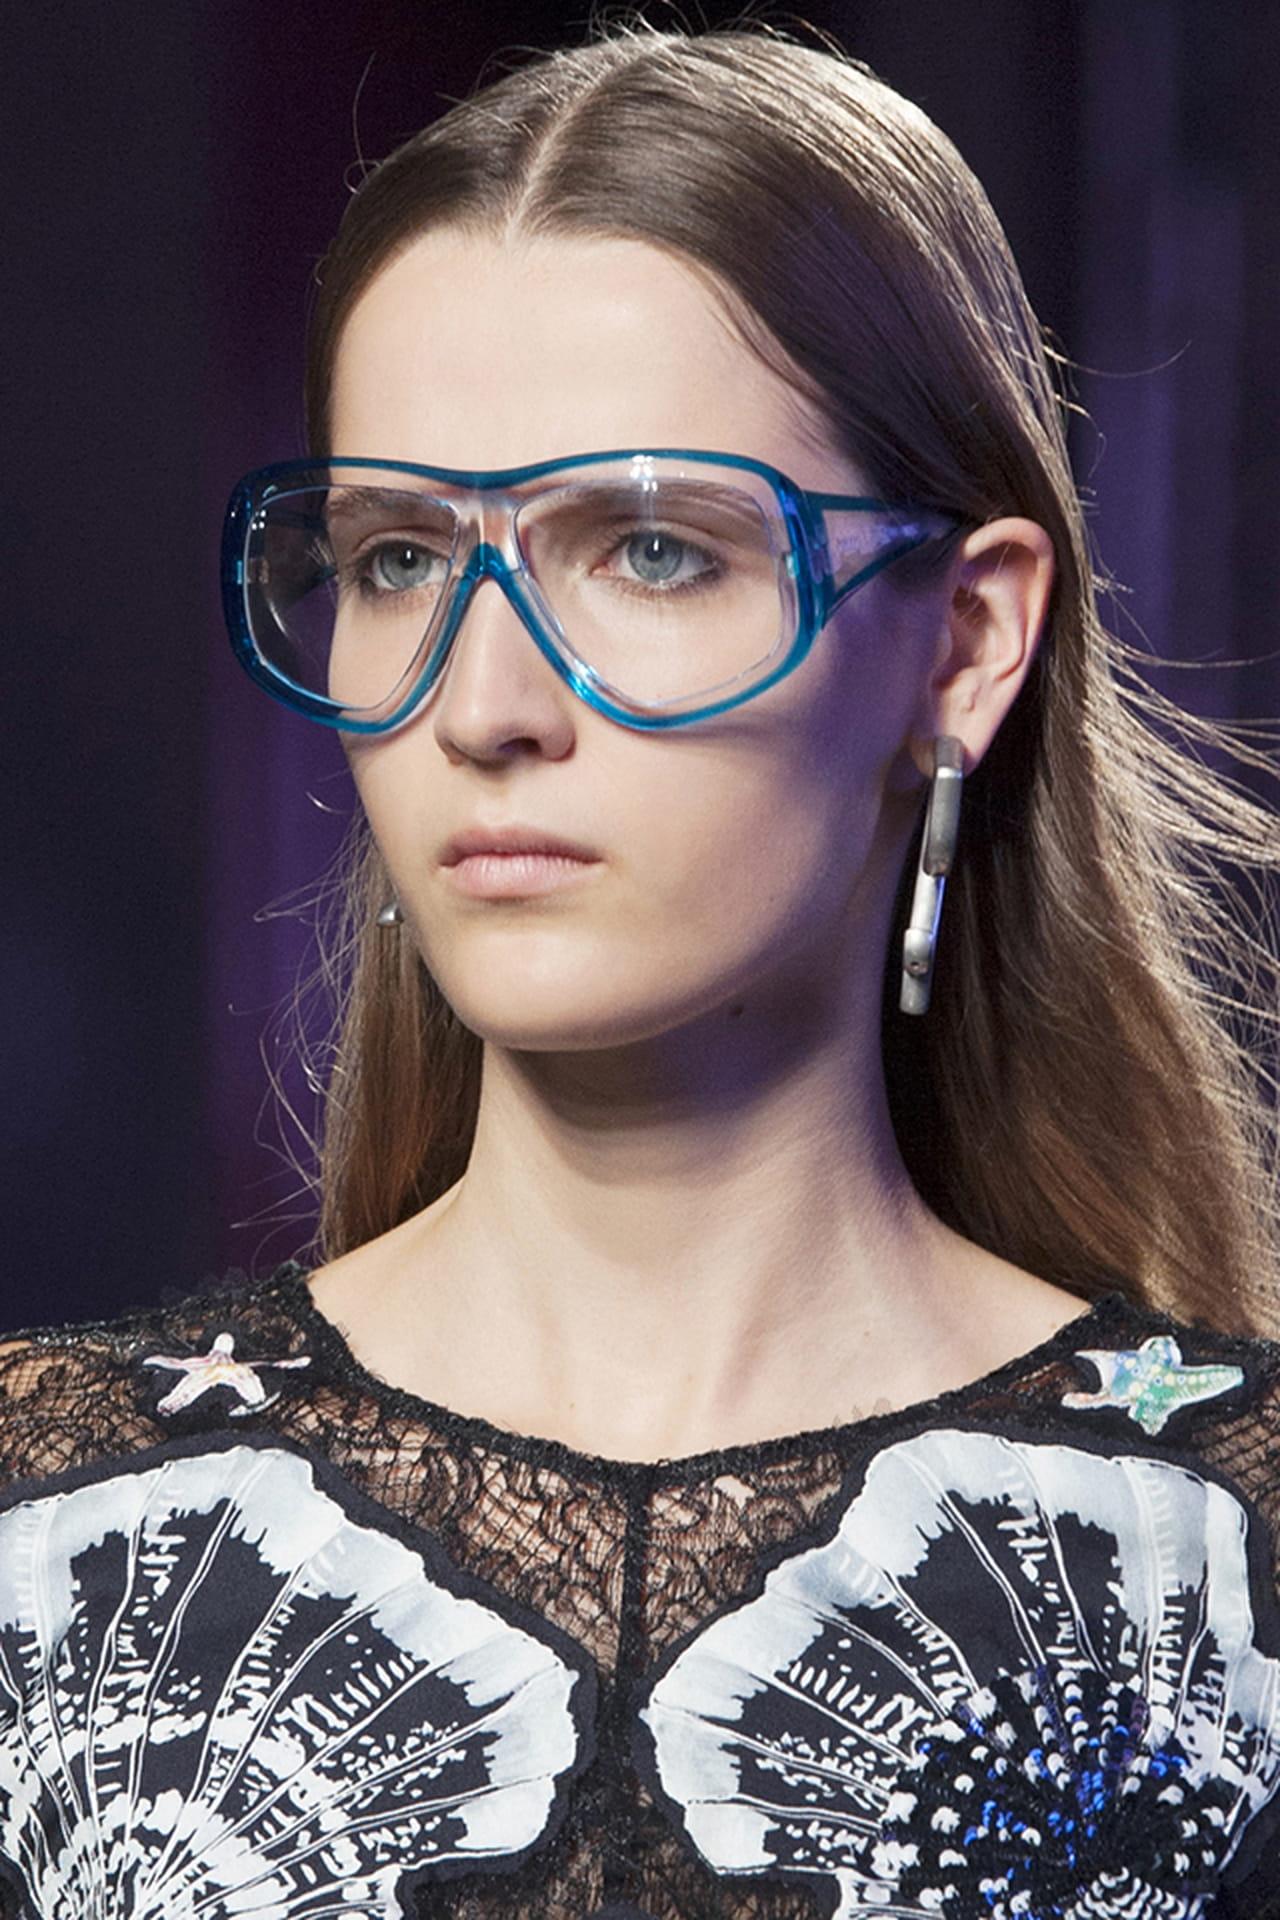 76a86dc6193a6 Descubra o modelo de óculos de grau ideal para seu tipo de rosto